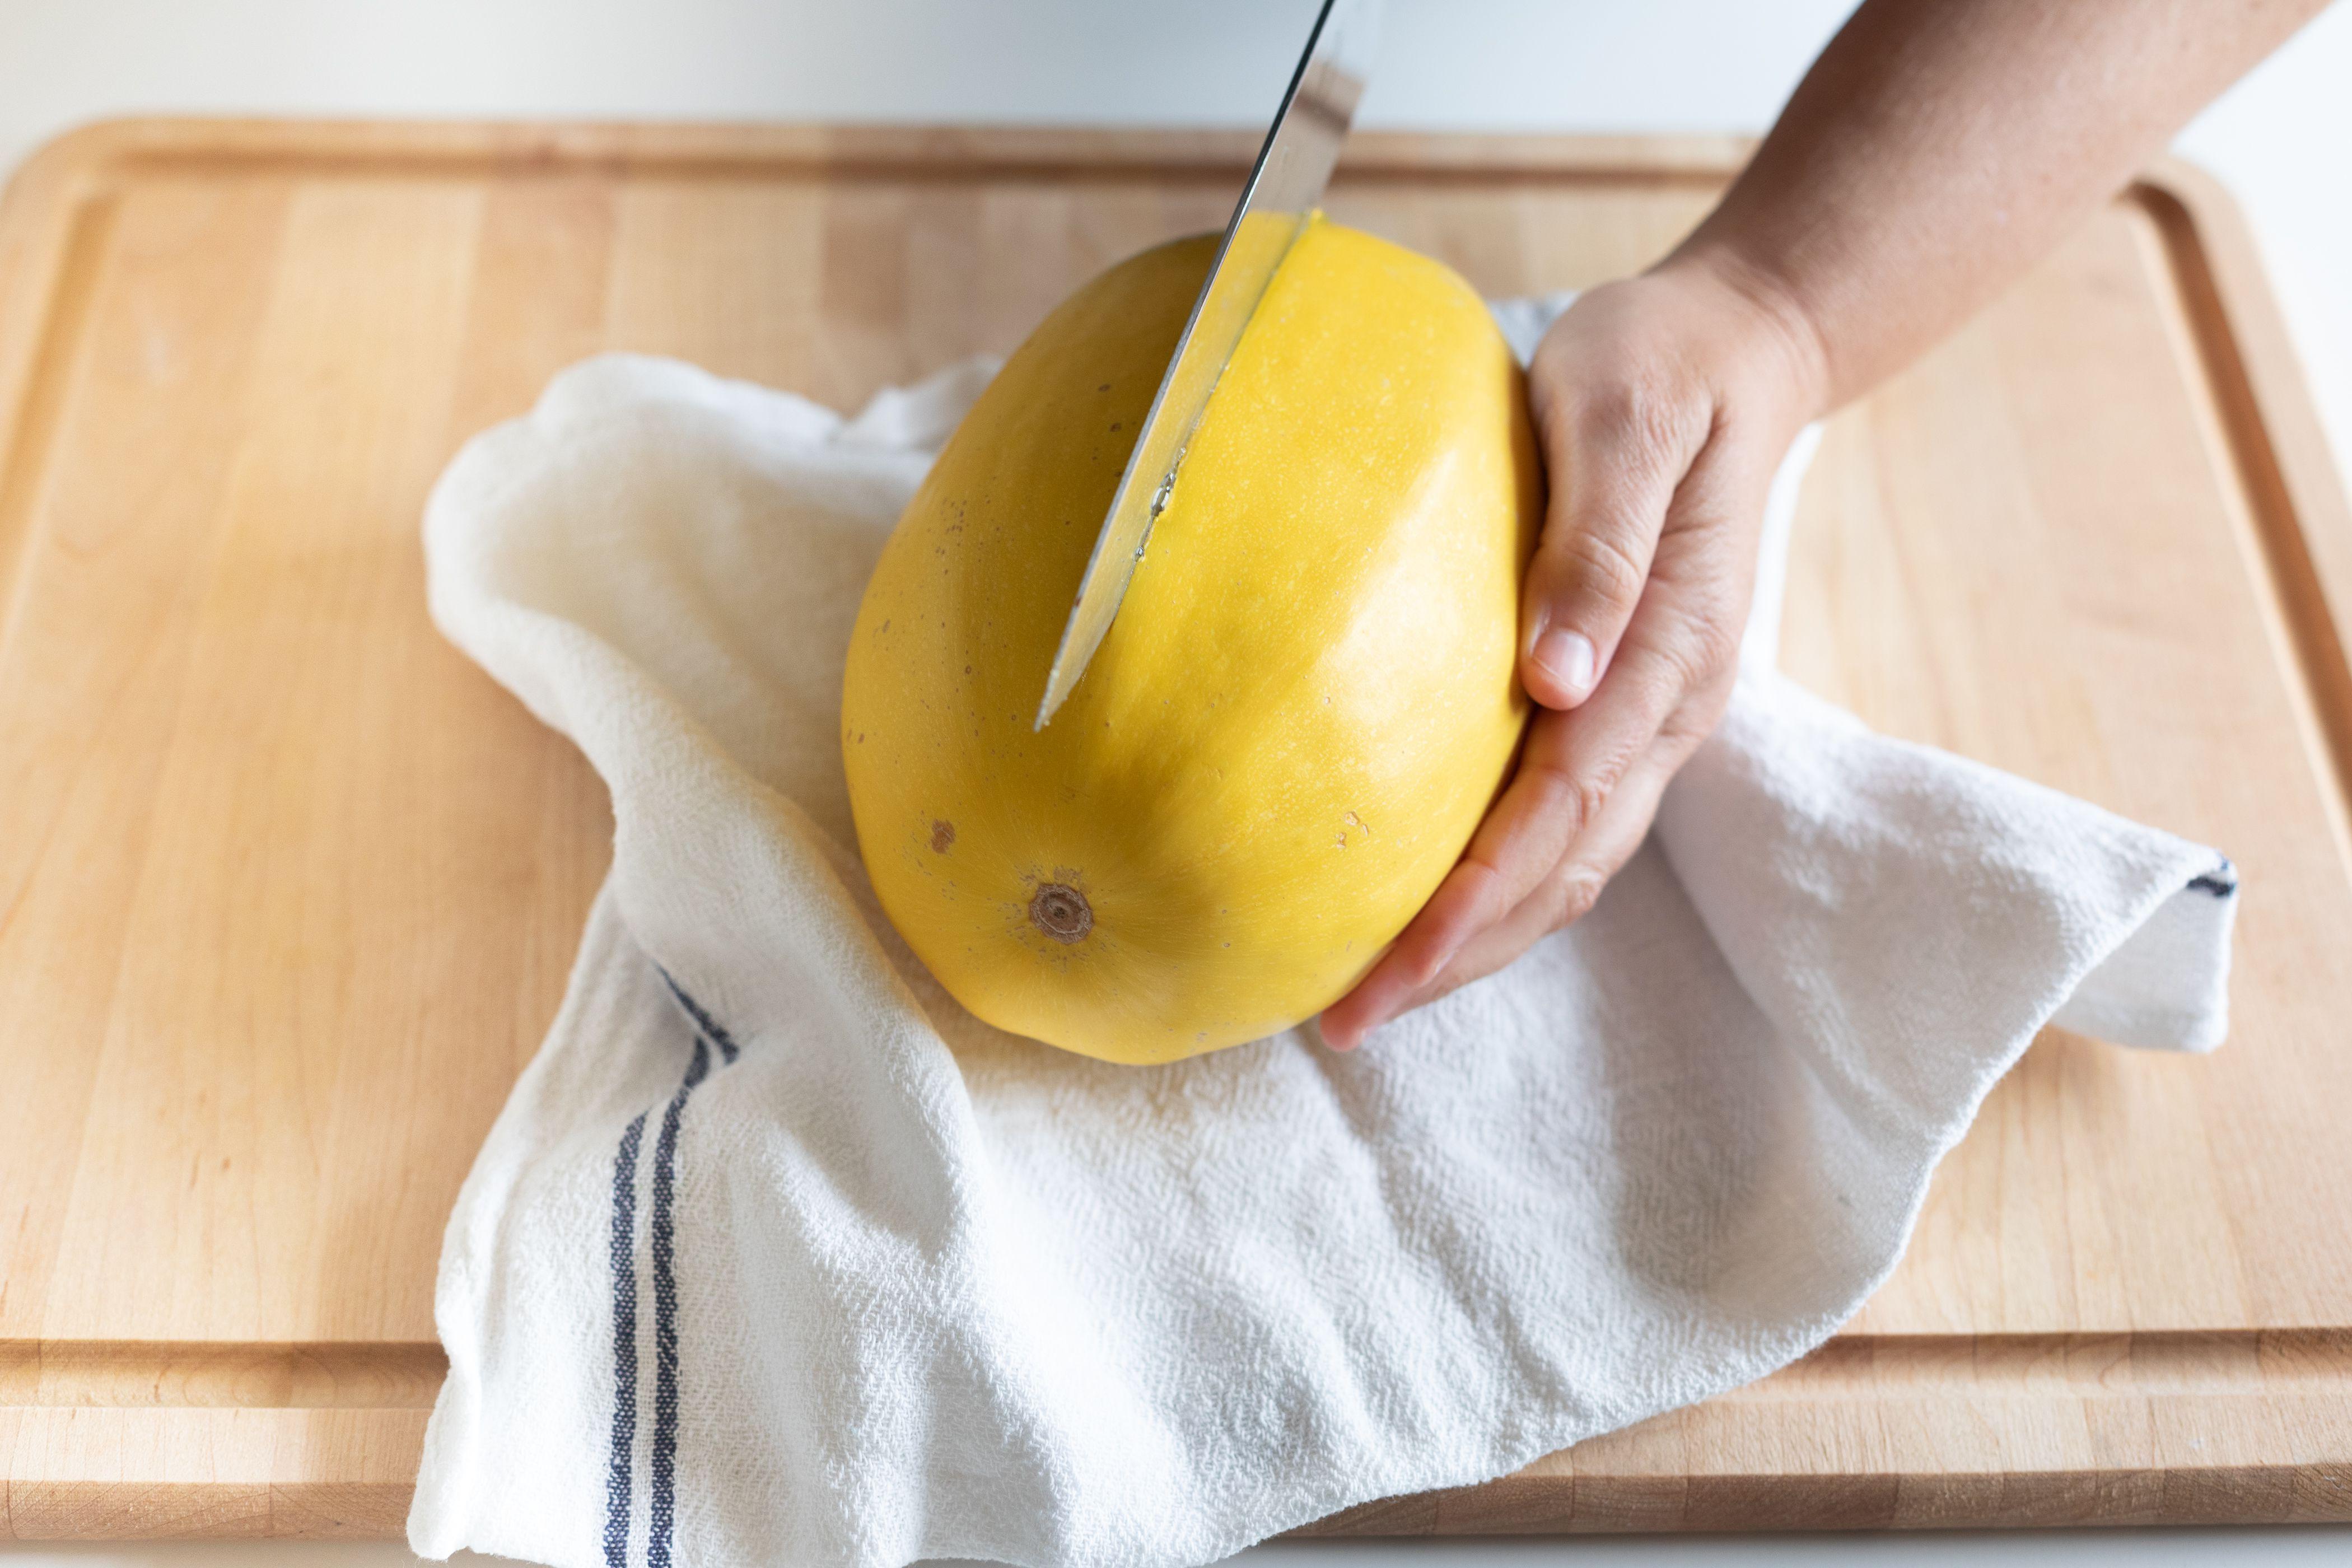 Cutting a spaghetti squash in half with a big chef's knife